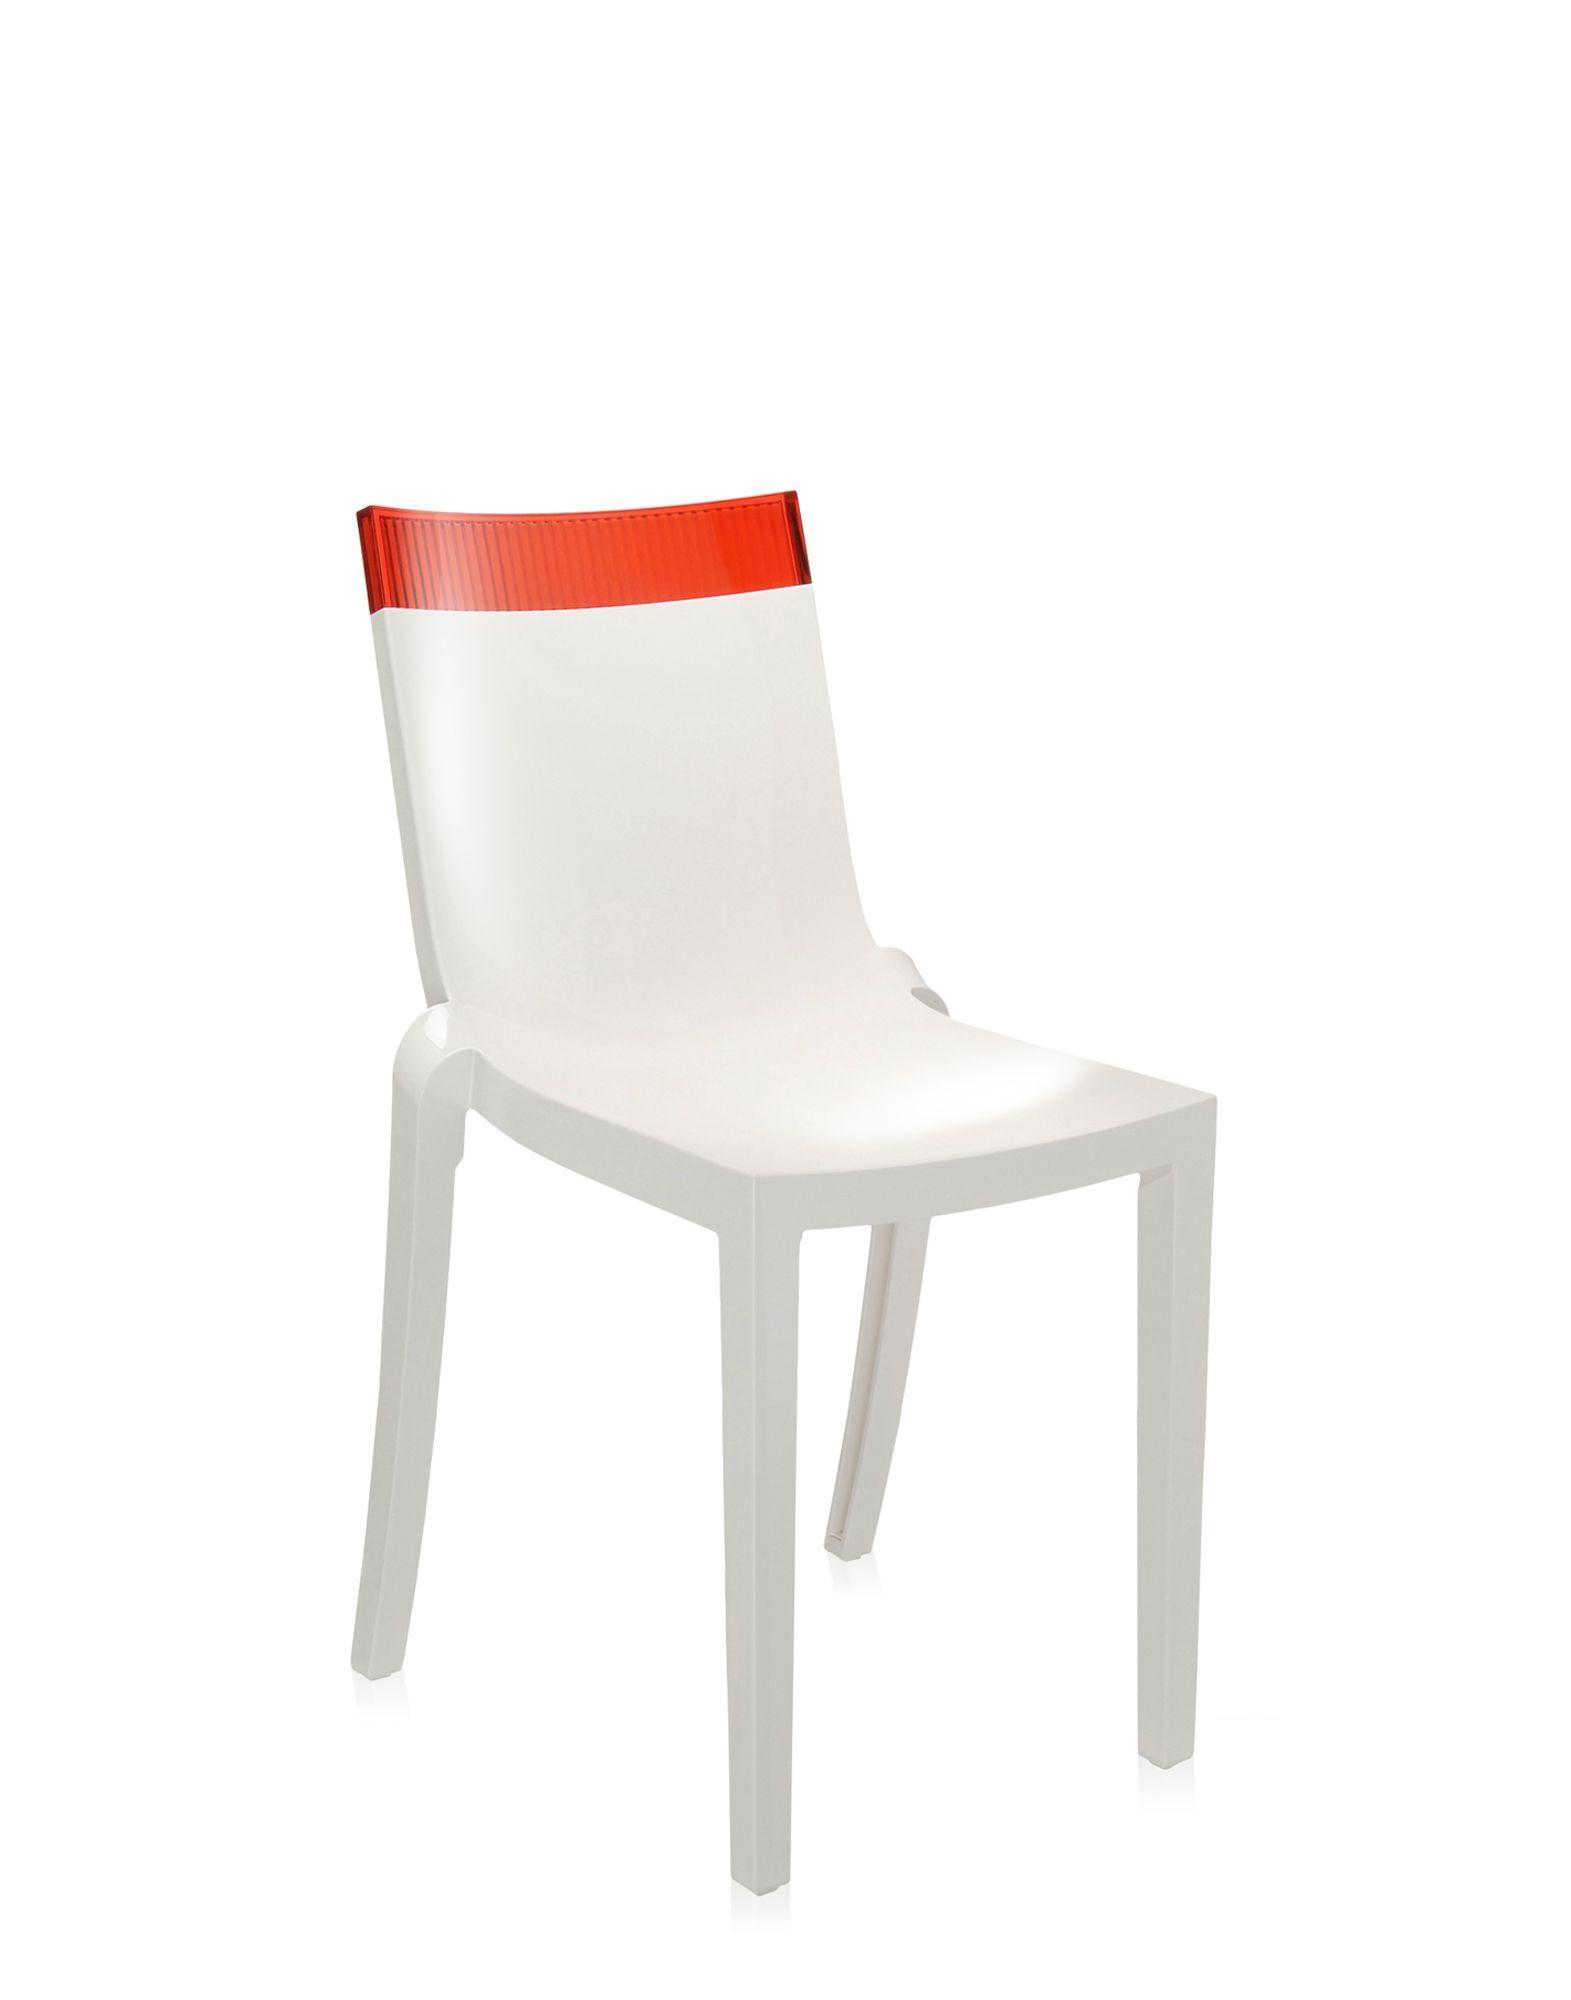 Kartell hi cut rosso bianco sedie design newformsdesign for Sedie design kartell